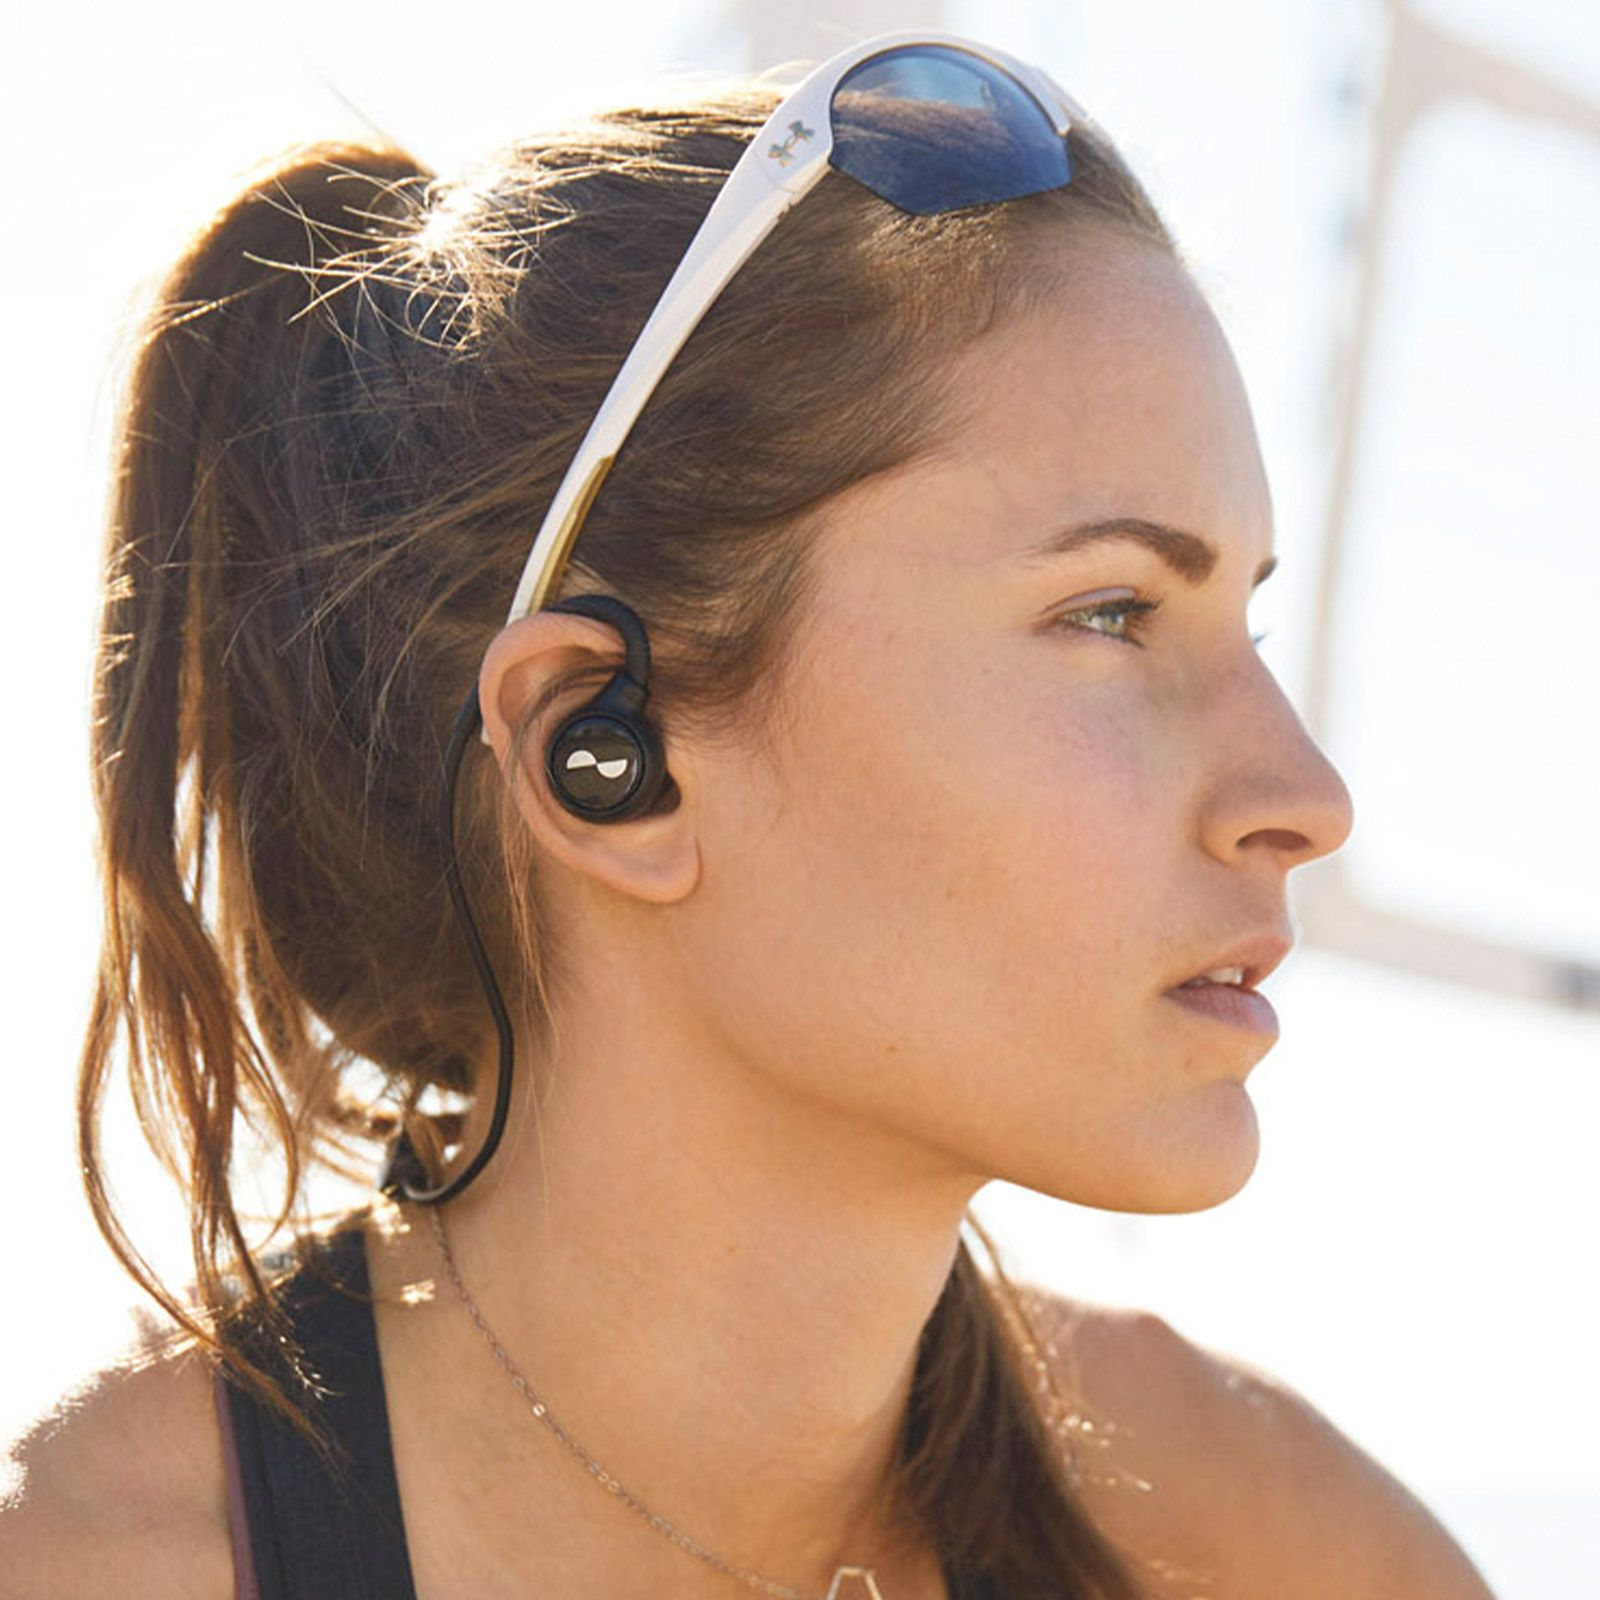 Person wearing sunglasses outside with NURALOOP earbuds in ears